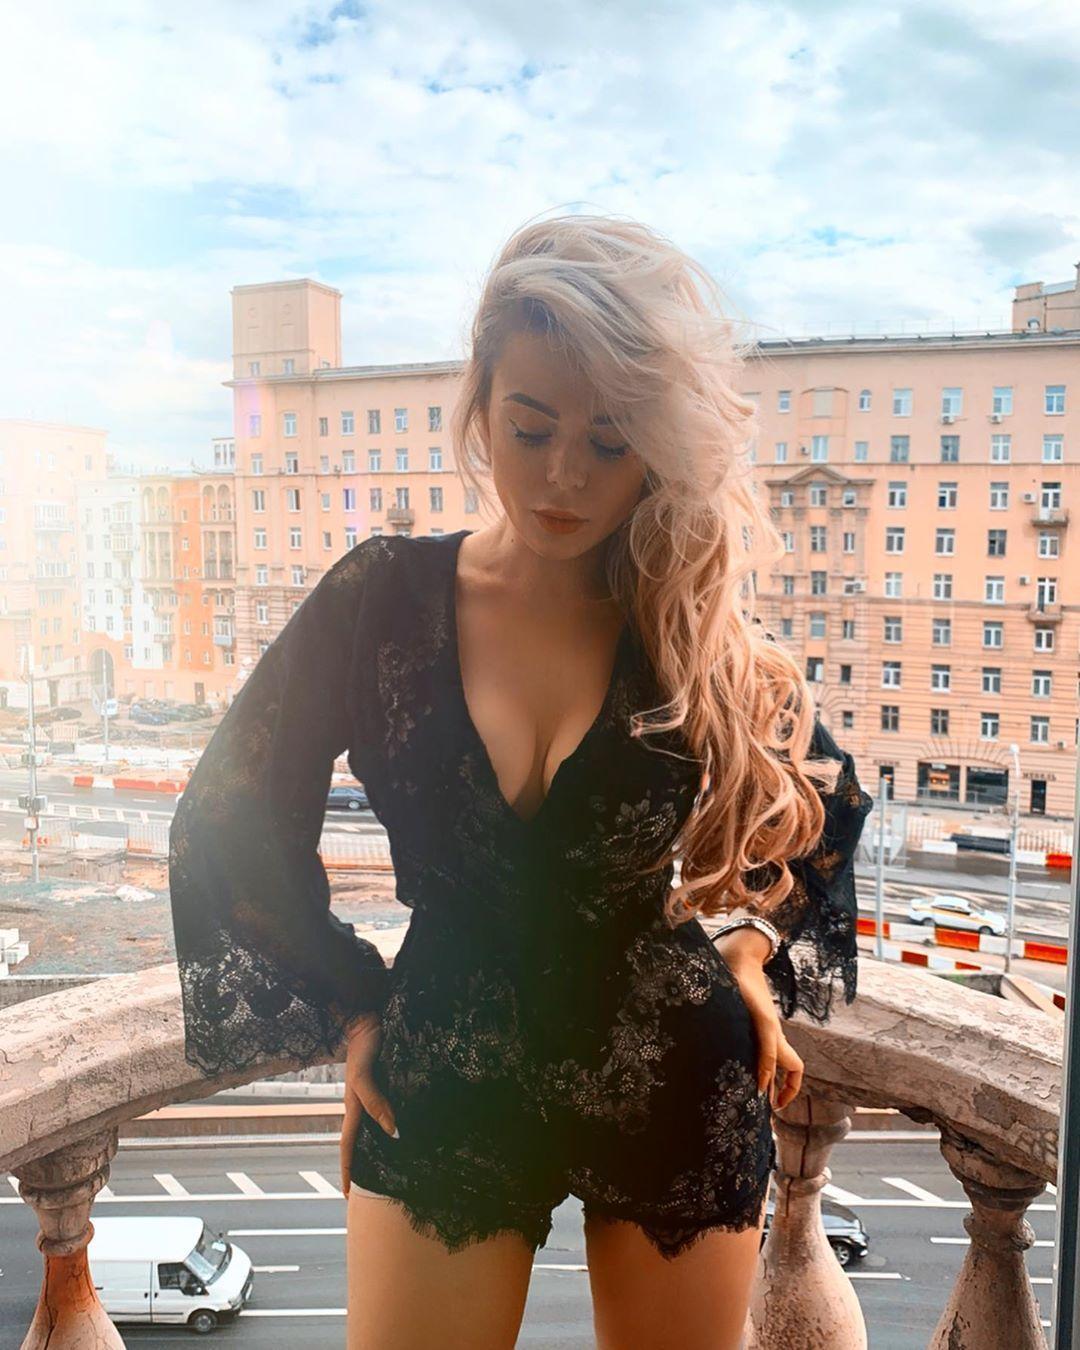 Аліна Гросу_1